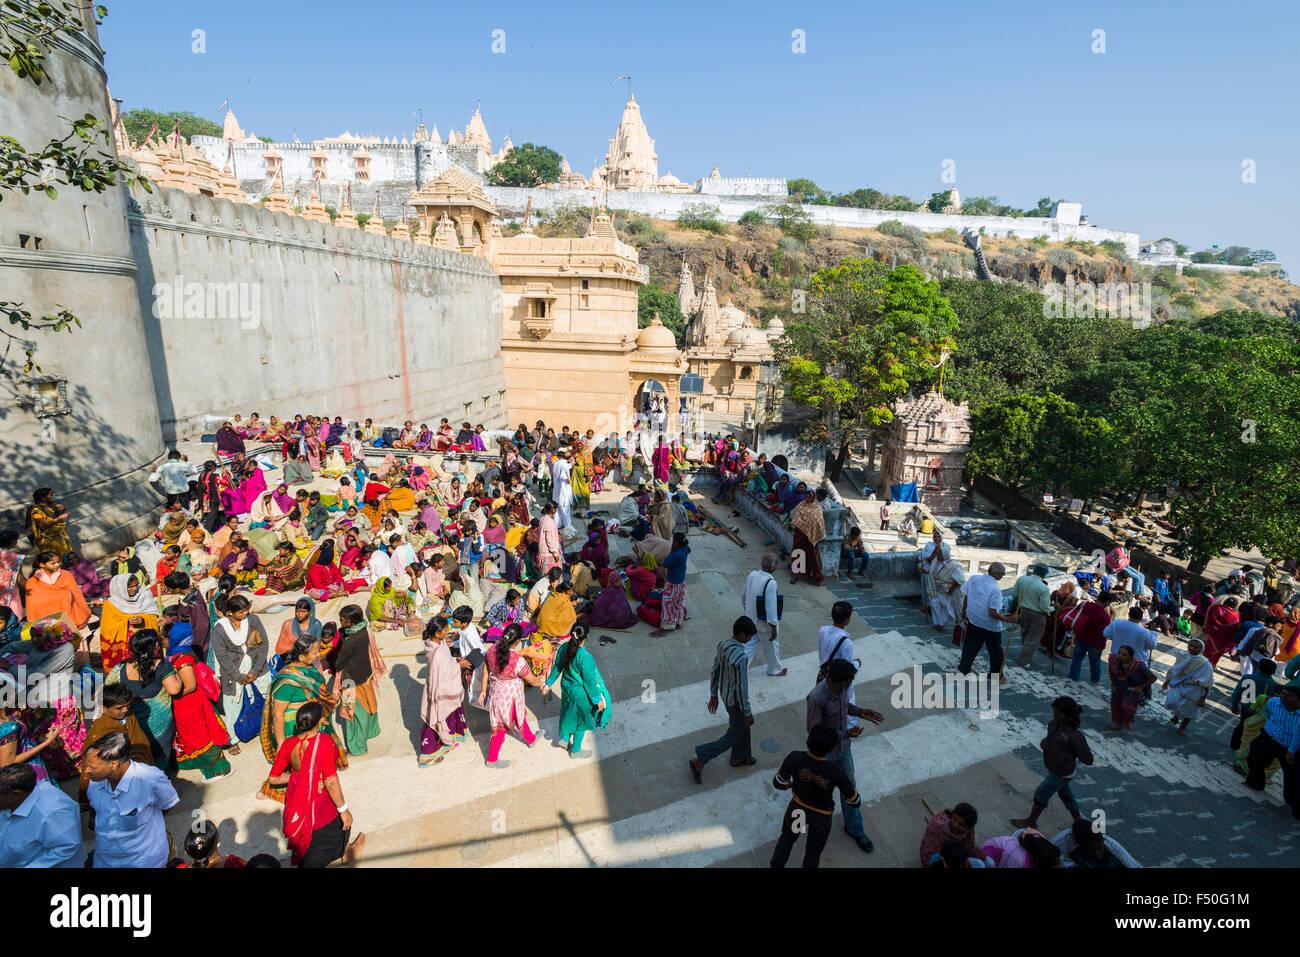 Thousands of Jain pilgrims are visiting Shatrunjaya hill, one of the major pilgrim sites for Jains, at the day of Stock Photo